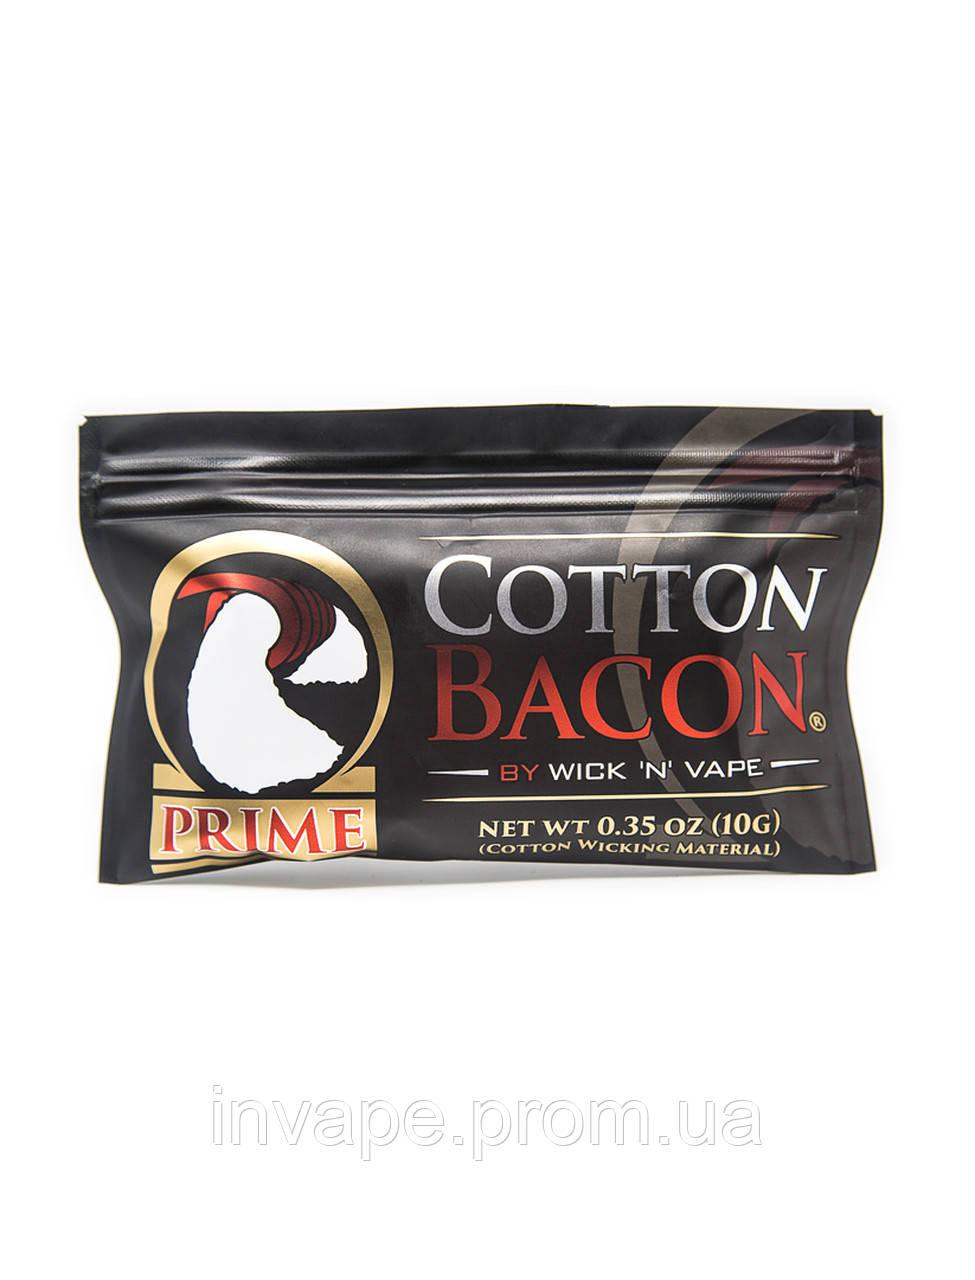 Хлопок Wick 'N' Vape Cotton Bacon PRIME